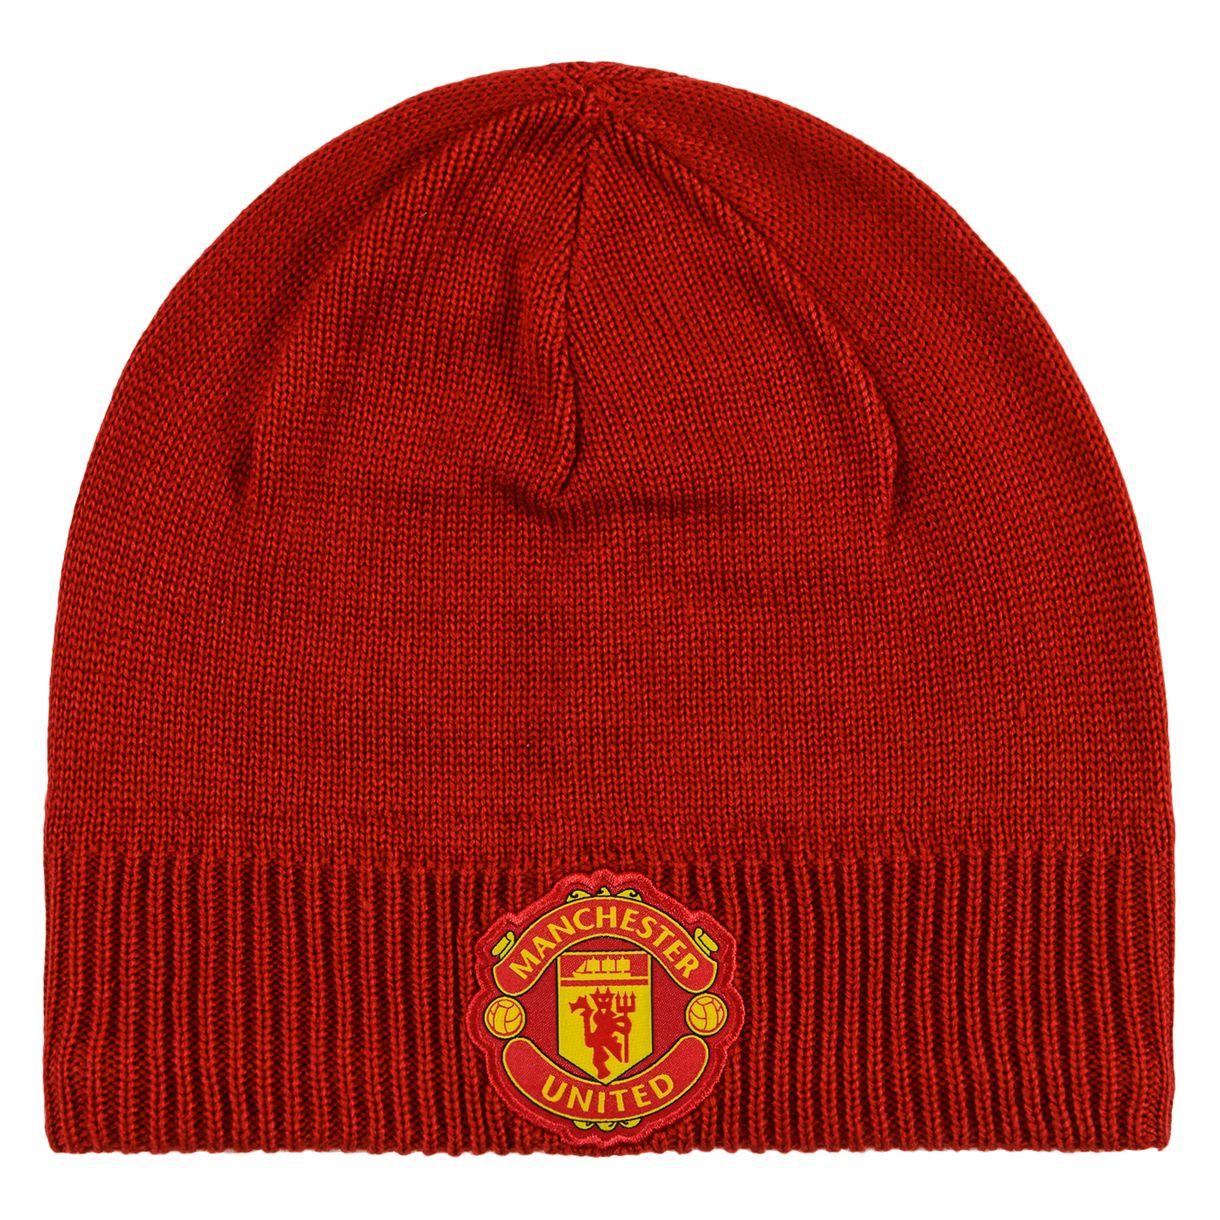 20162017 Man Utd Adidas 3S Beanie (Red)